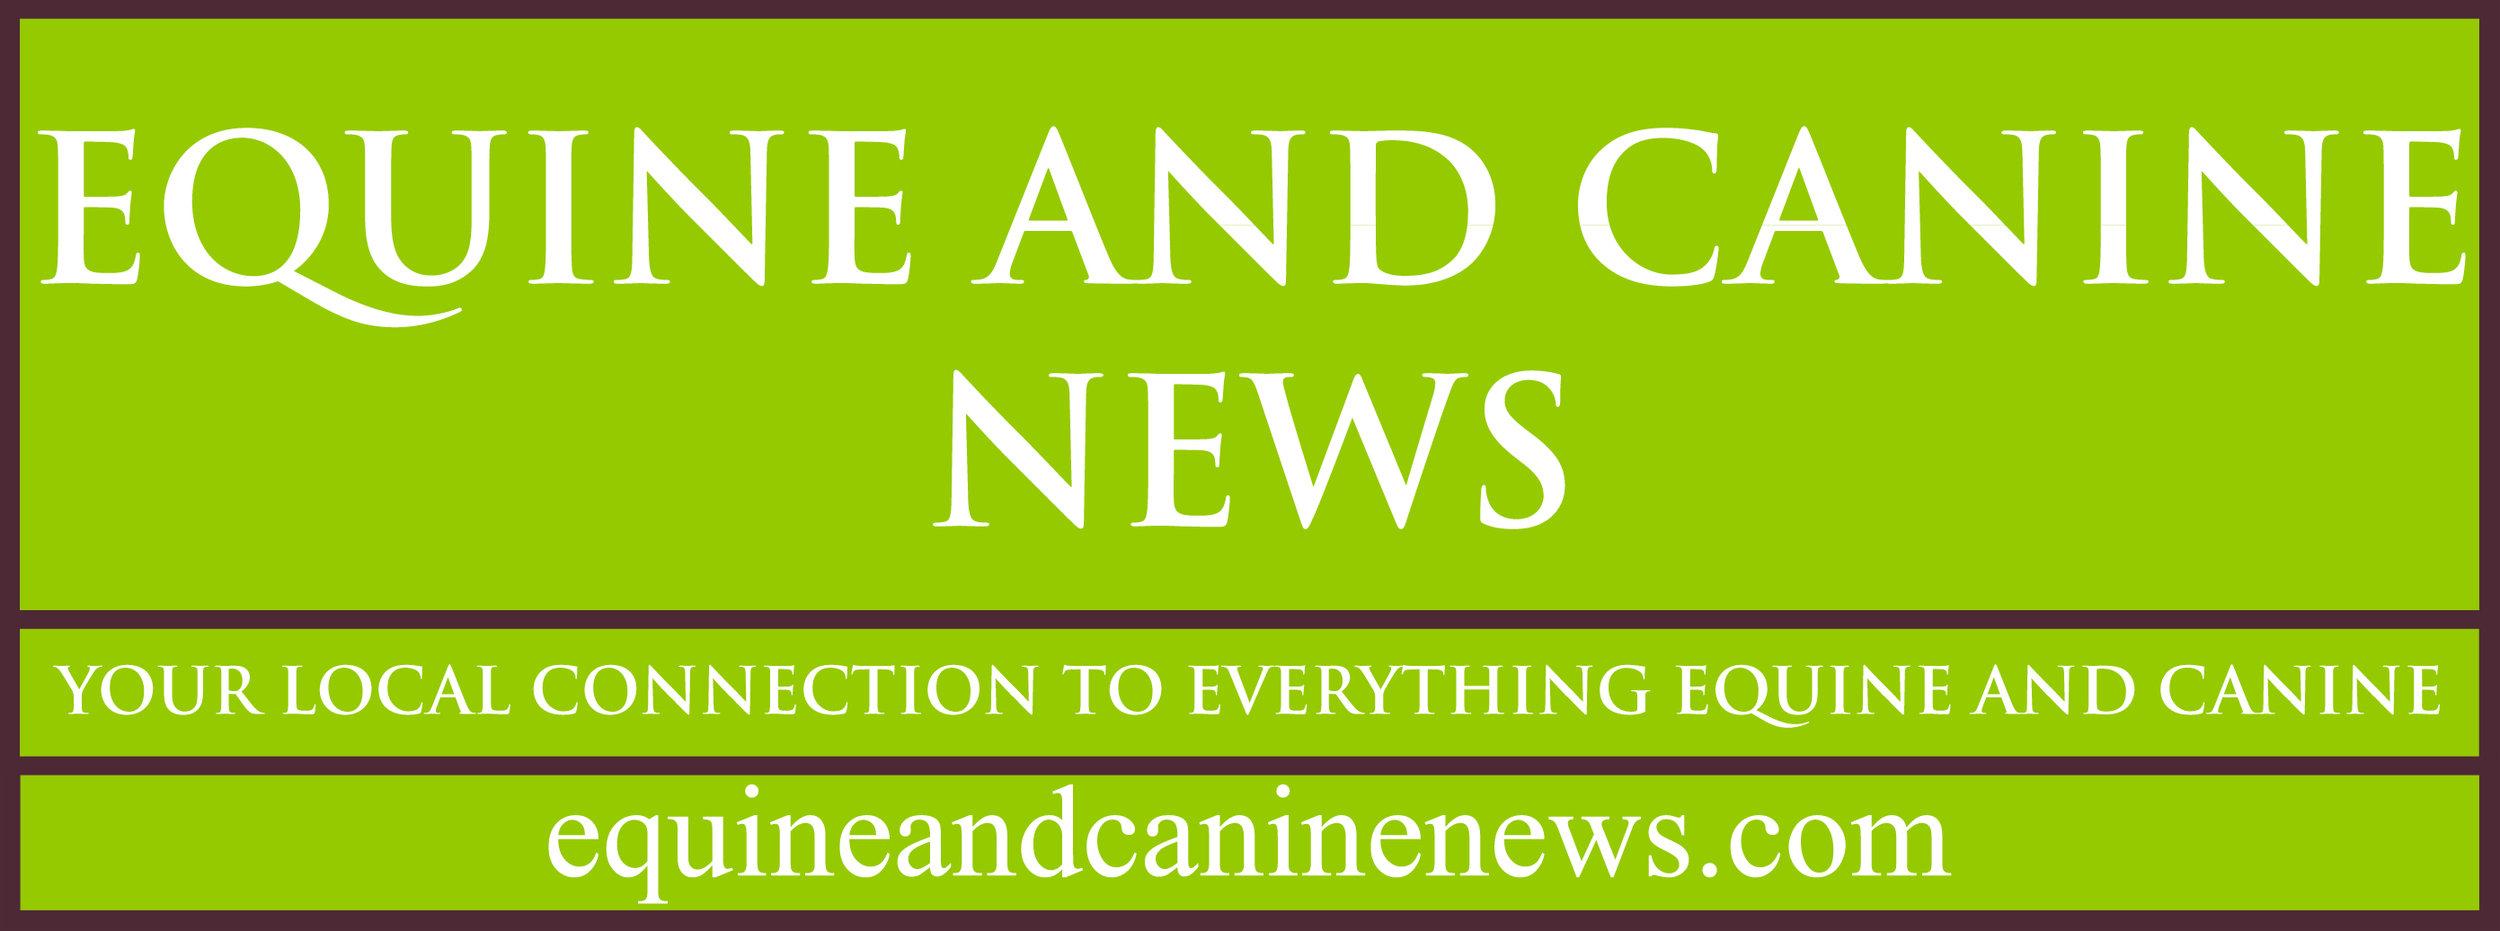 Equine and Canine News Logo June 2012  jpg file.jpg